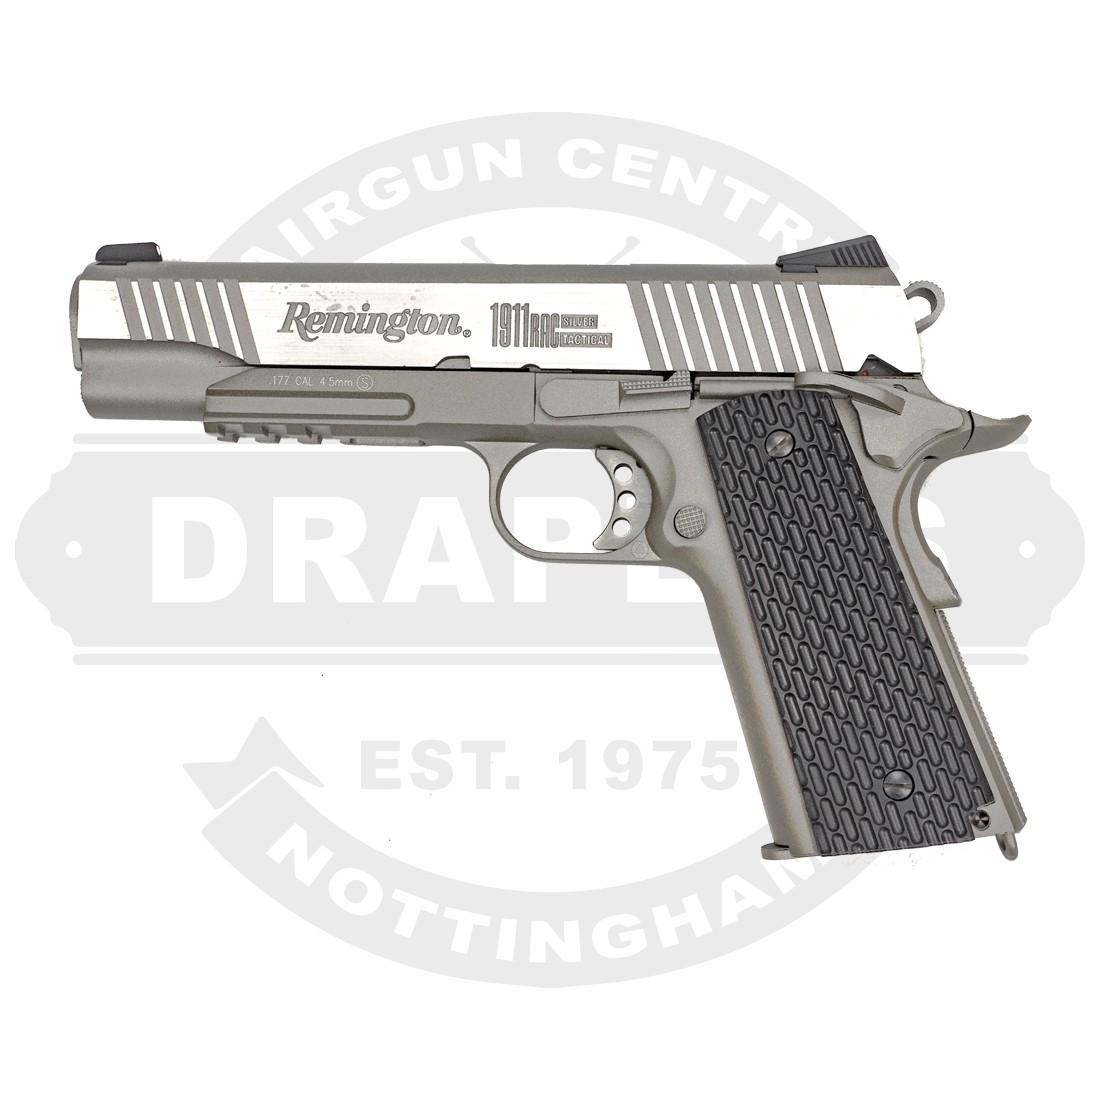 Remington Rac Tactical Silver 4 5mm Bb